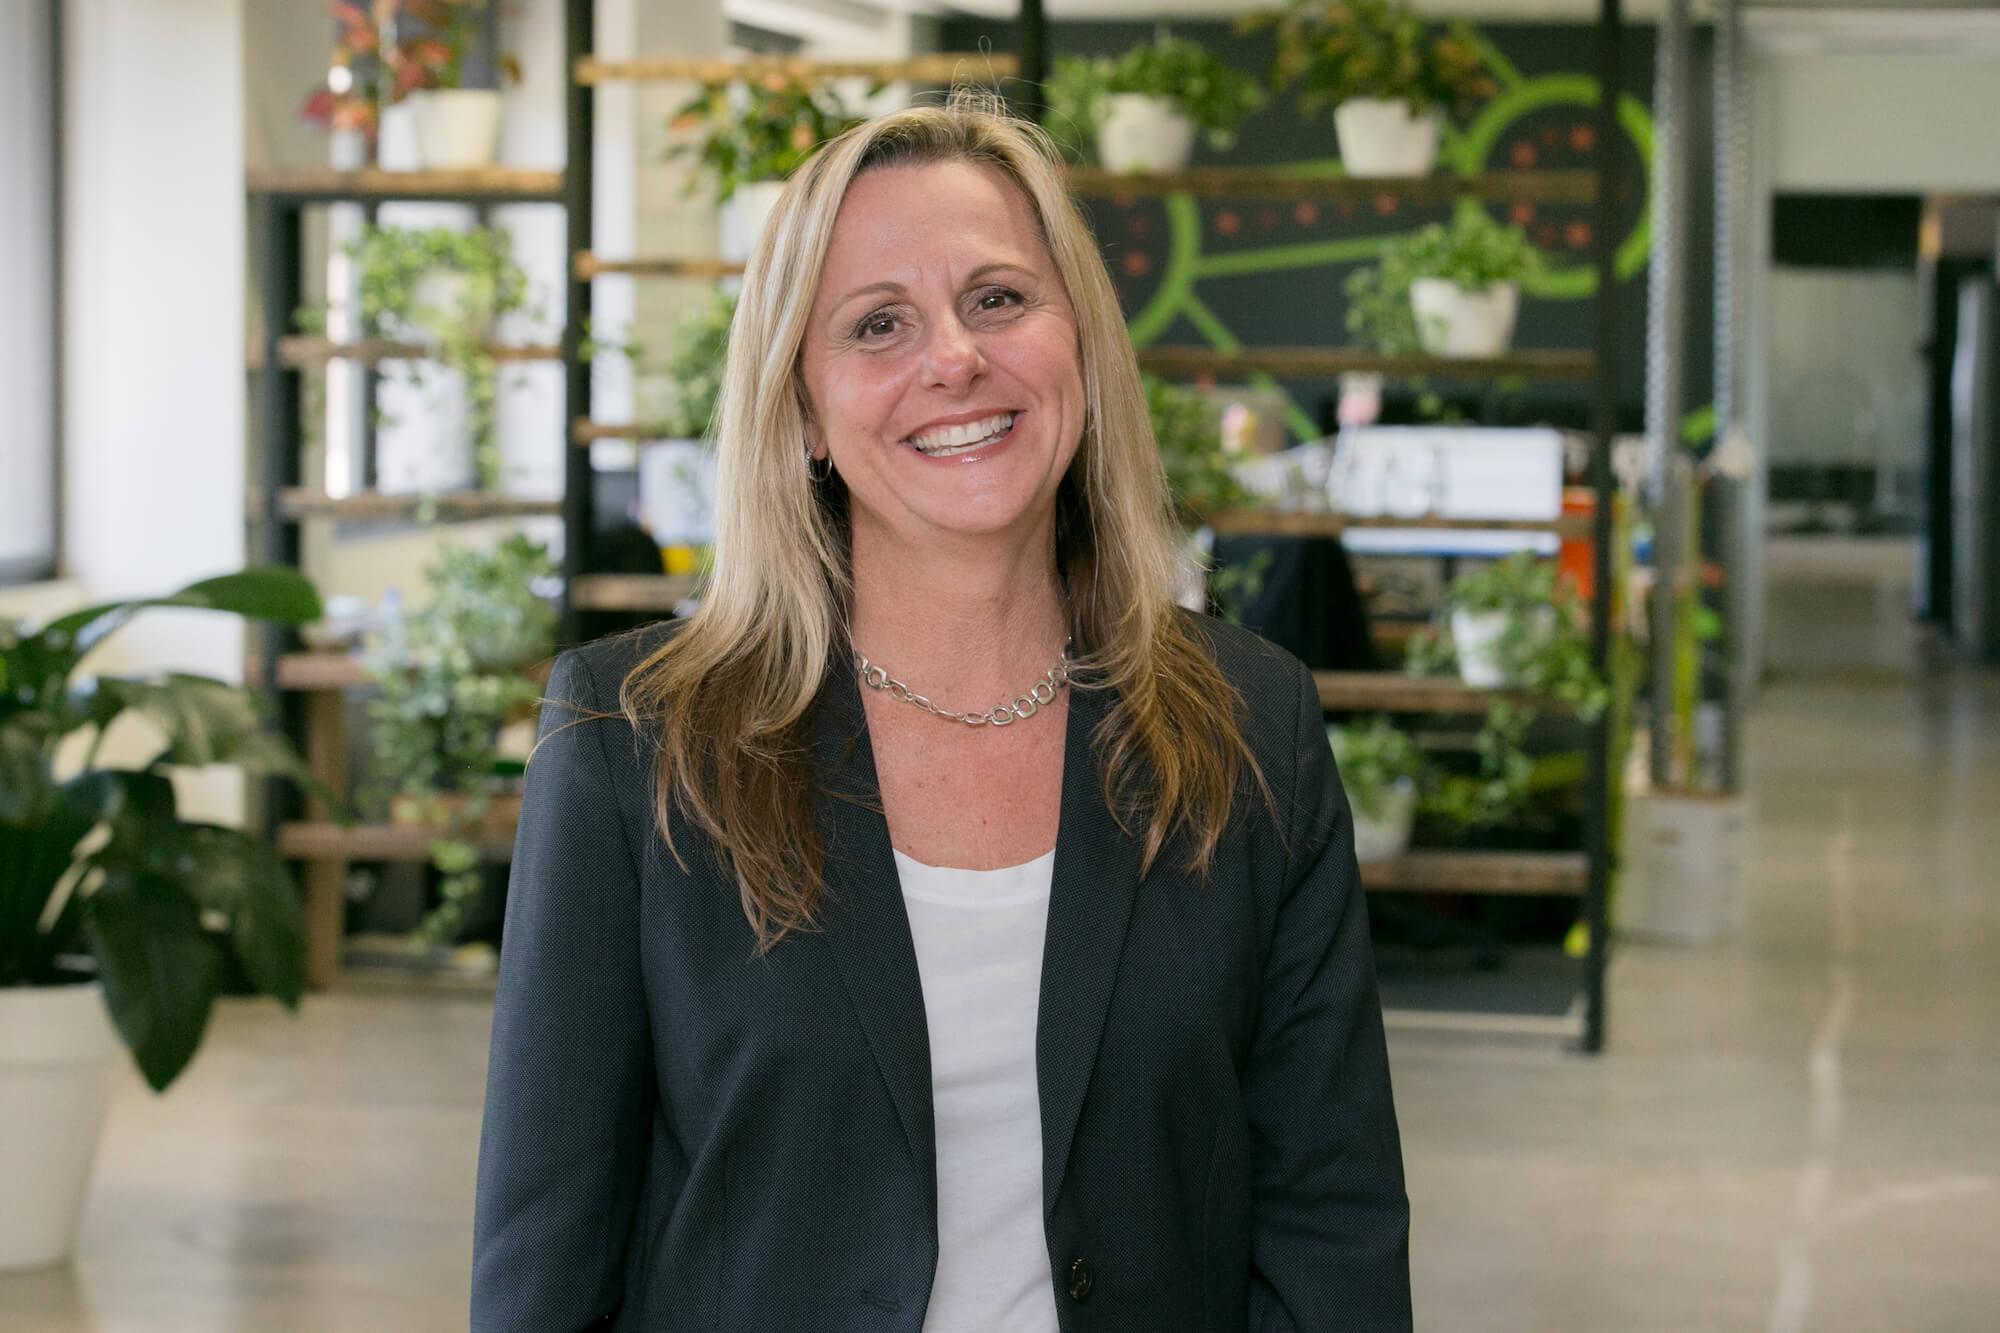 Melissa Pye muru-D startup accelerator